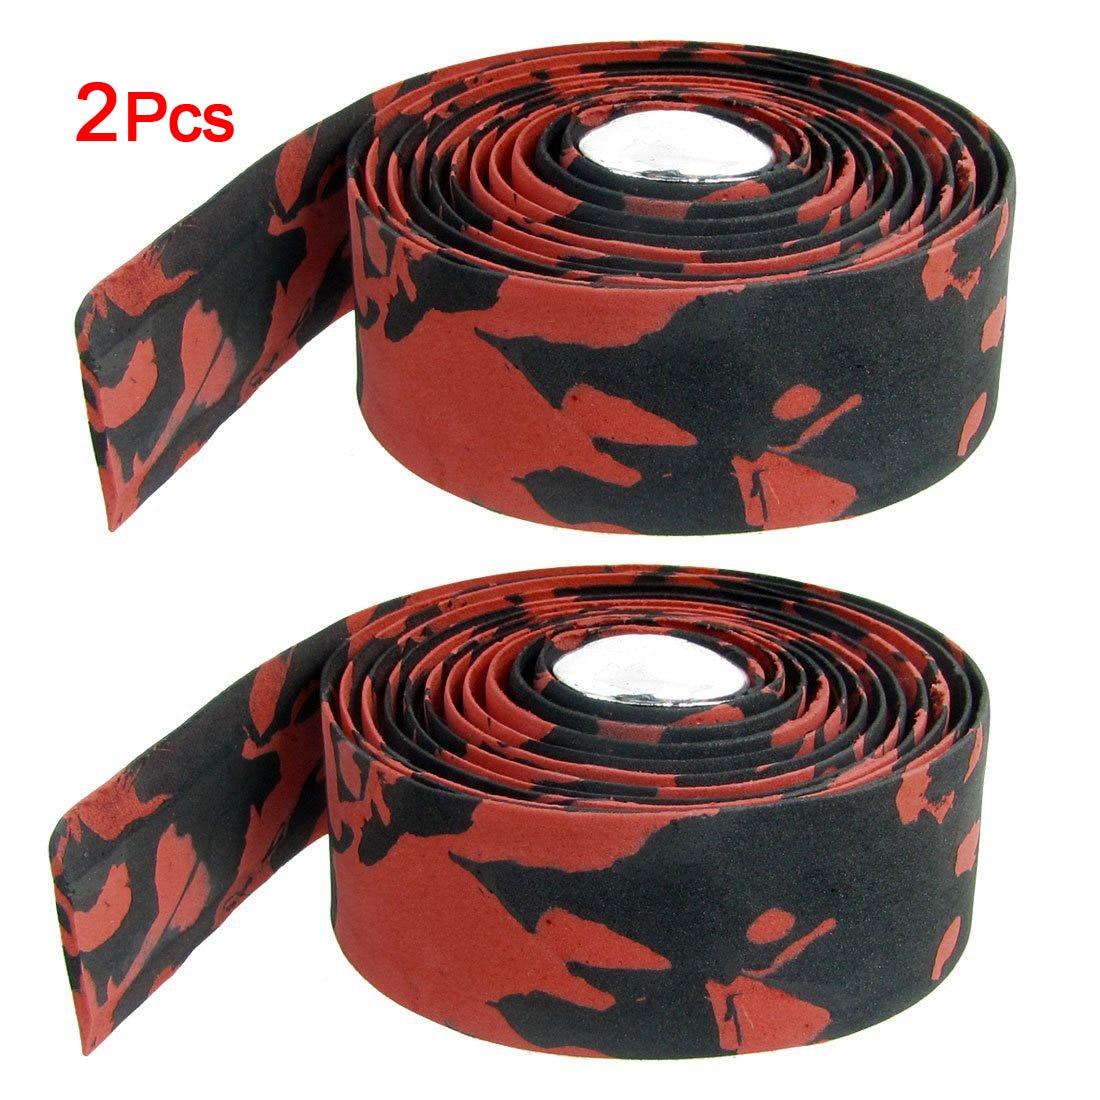 Road Race Bike Bicycle Cycling Handlebar Black Tape Ribbon Wraps with 2 Plugs